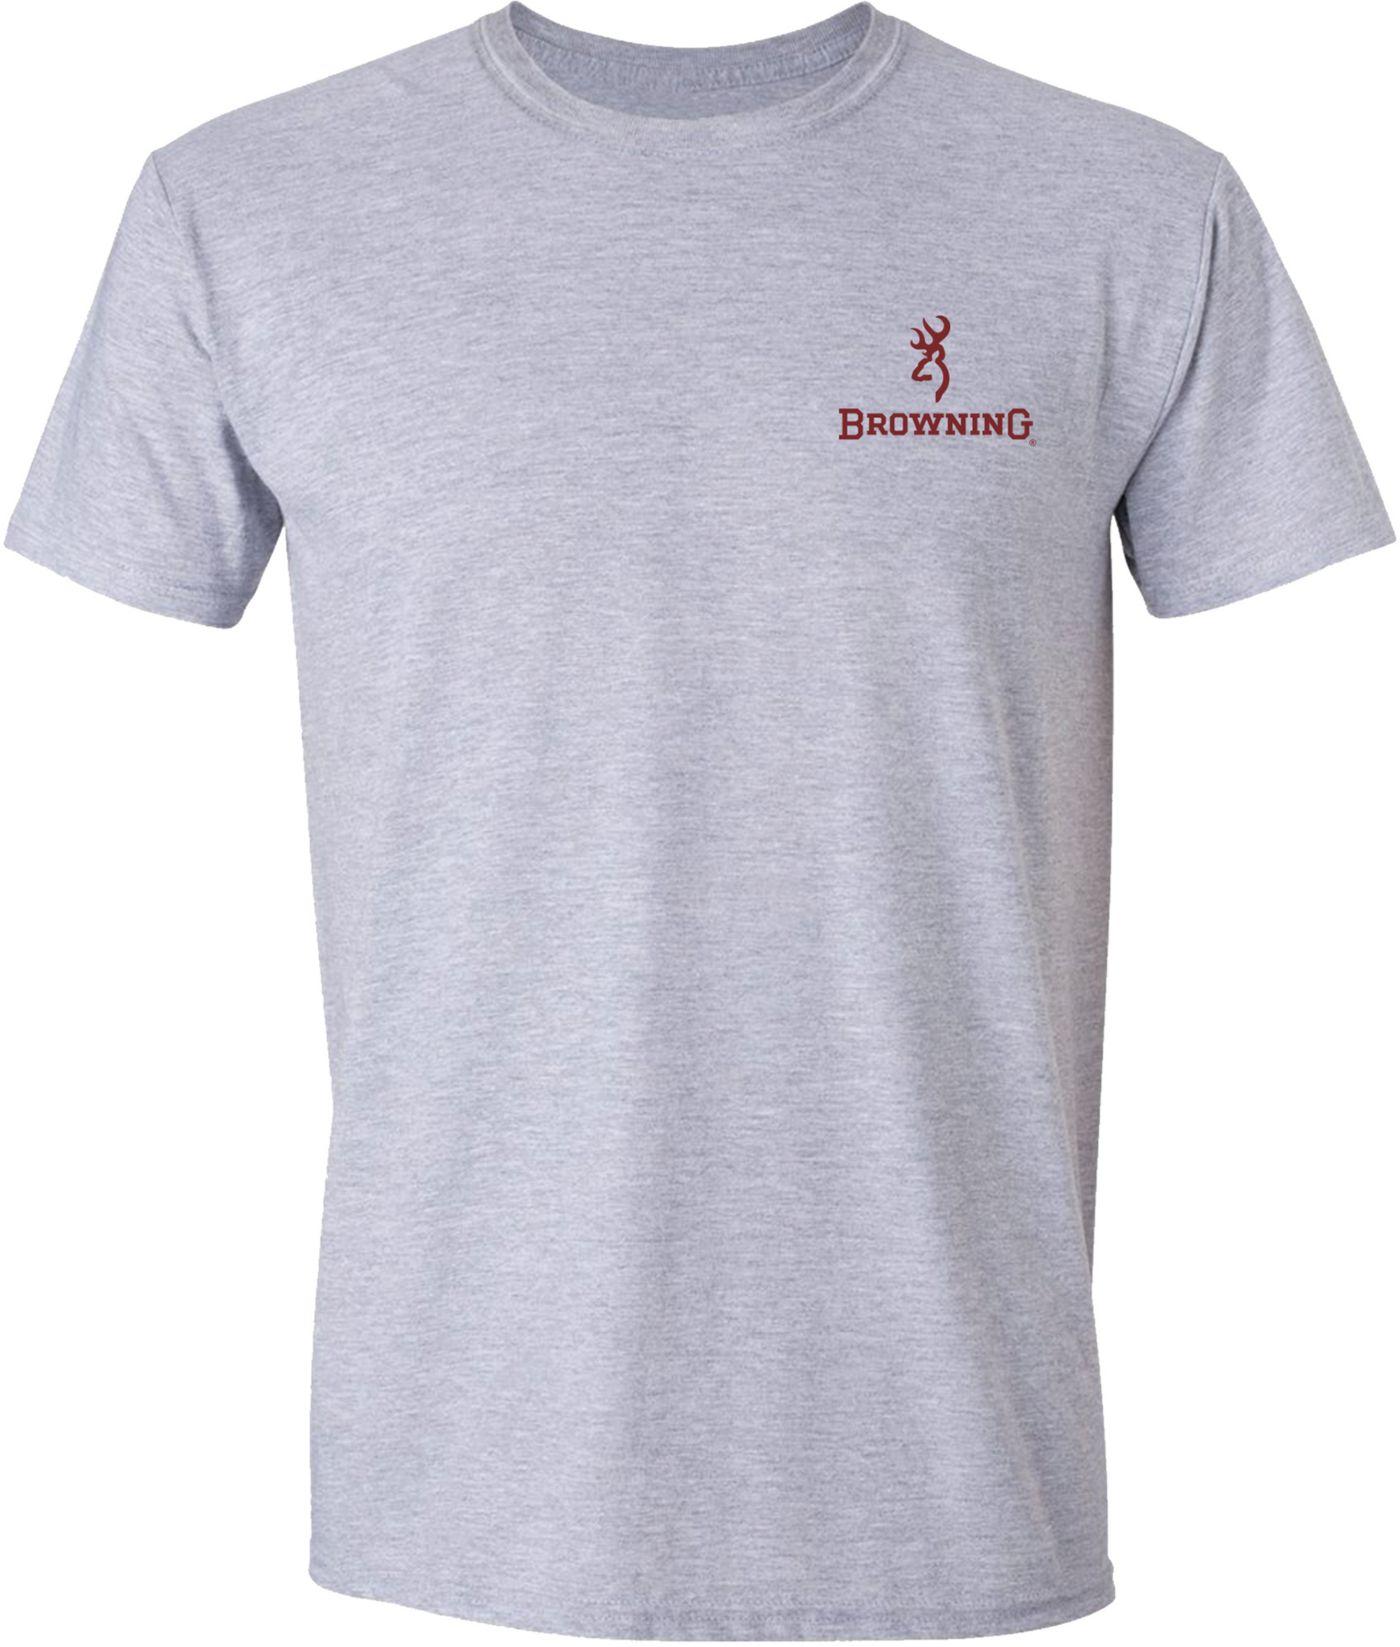 Browning Men's Ohio Stamp T-Shirt